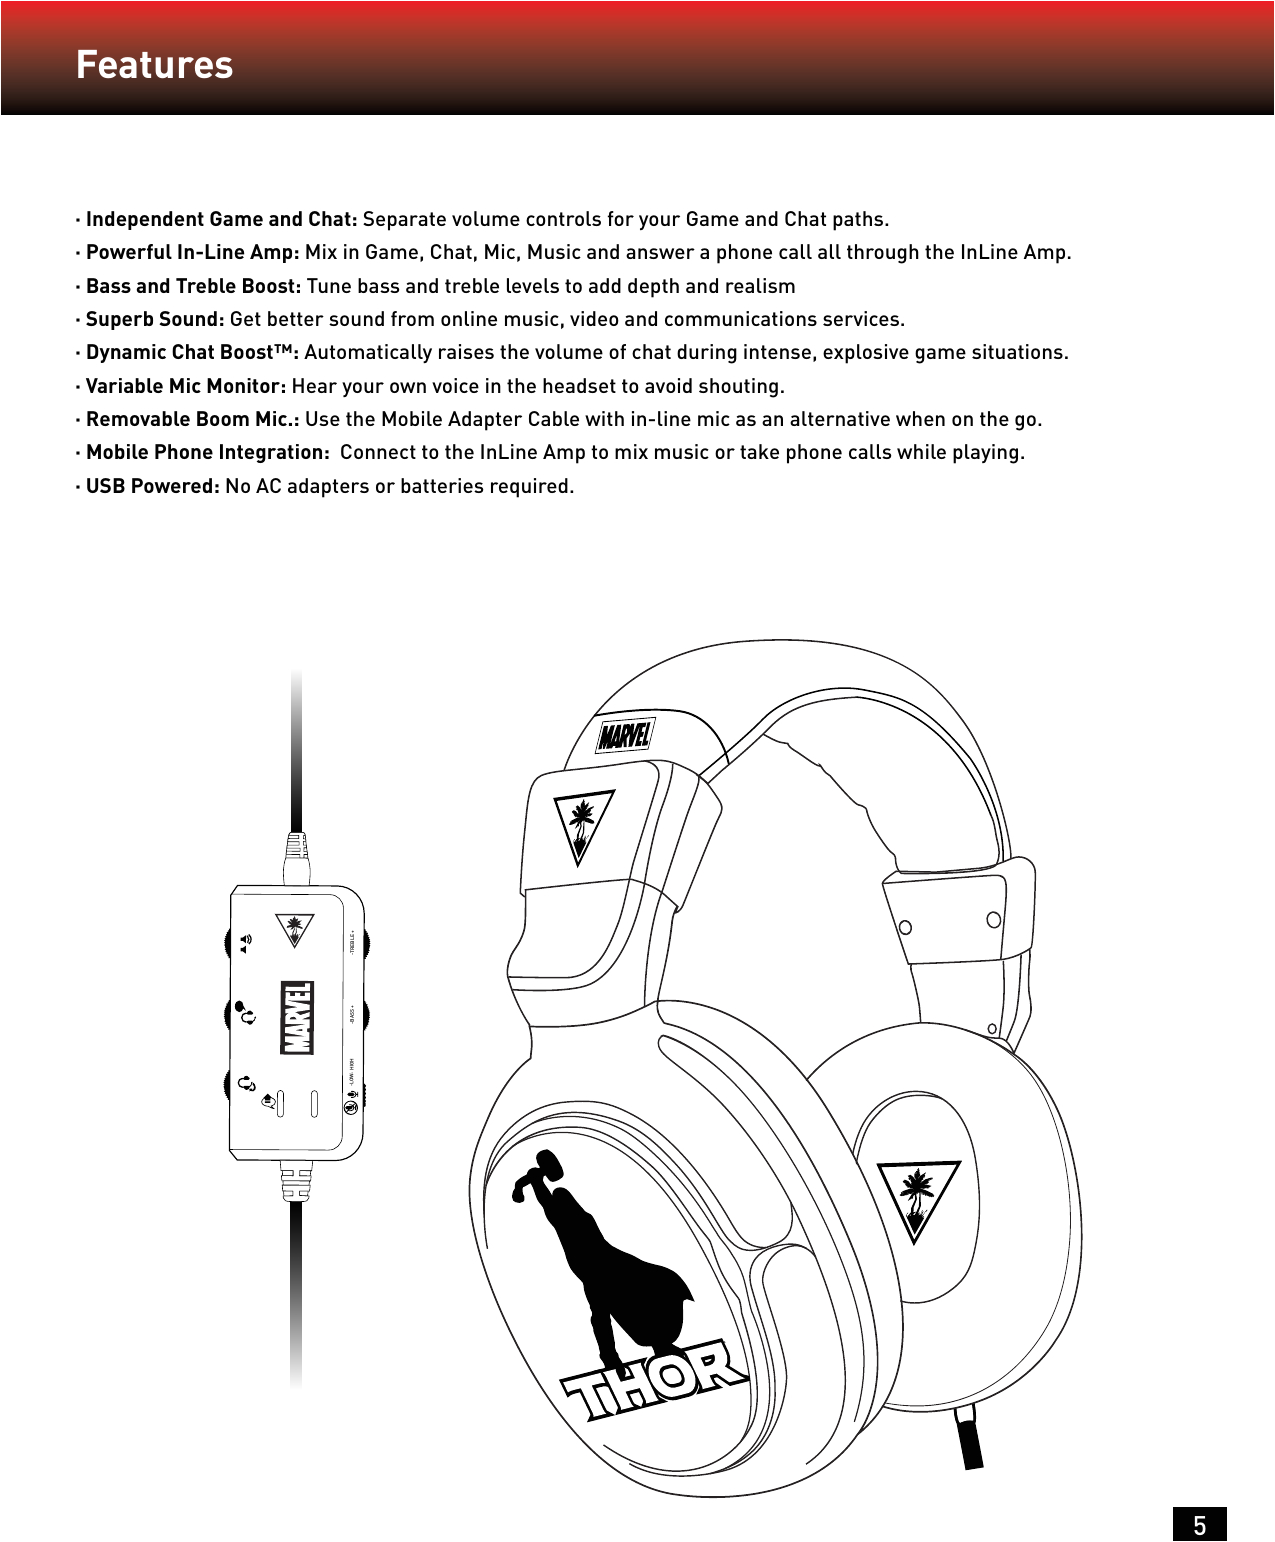 turtlebeachmarvelsevenuserguideownersmanual 988367274 user guide page 5 png